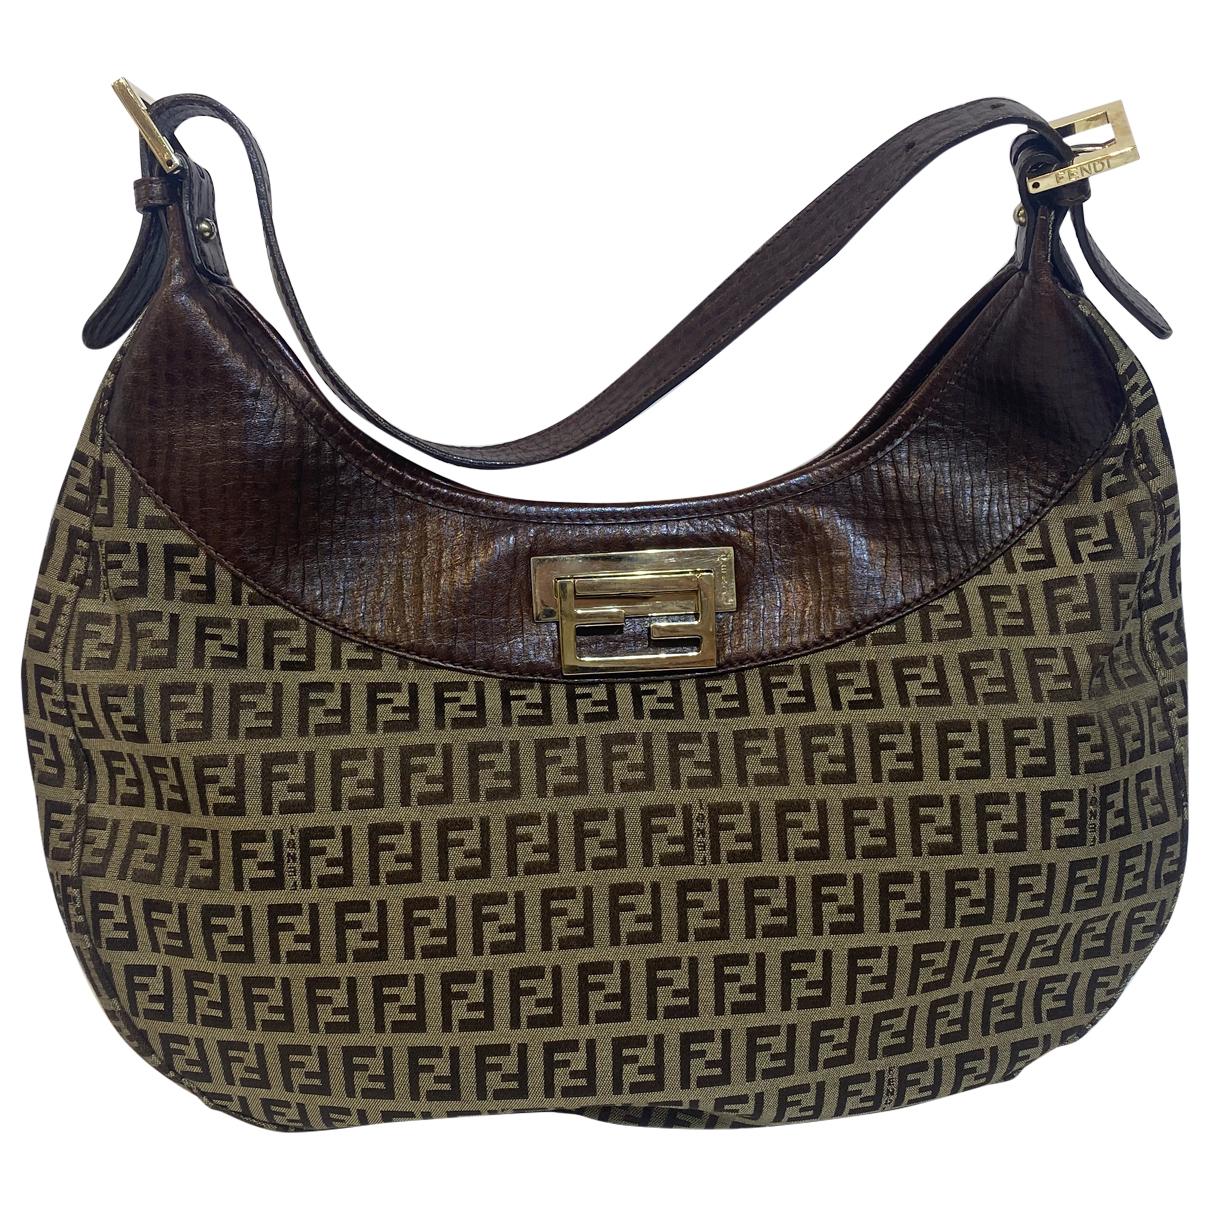 Fendi \N Brown Cotton handbag for Women \N